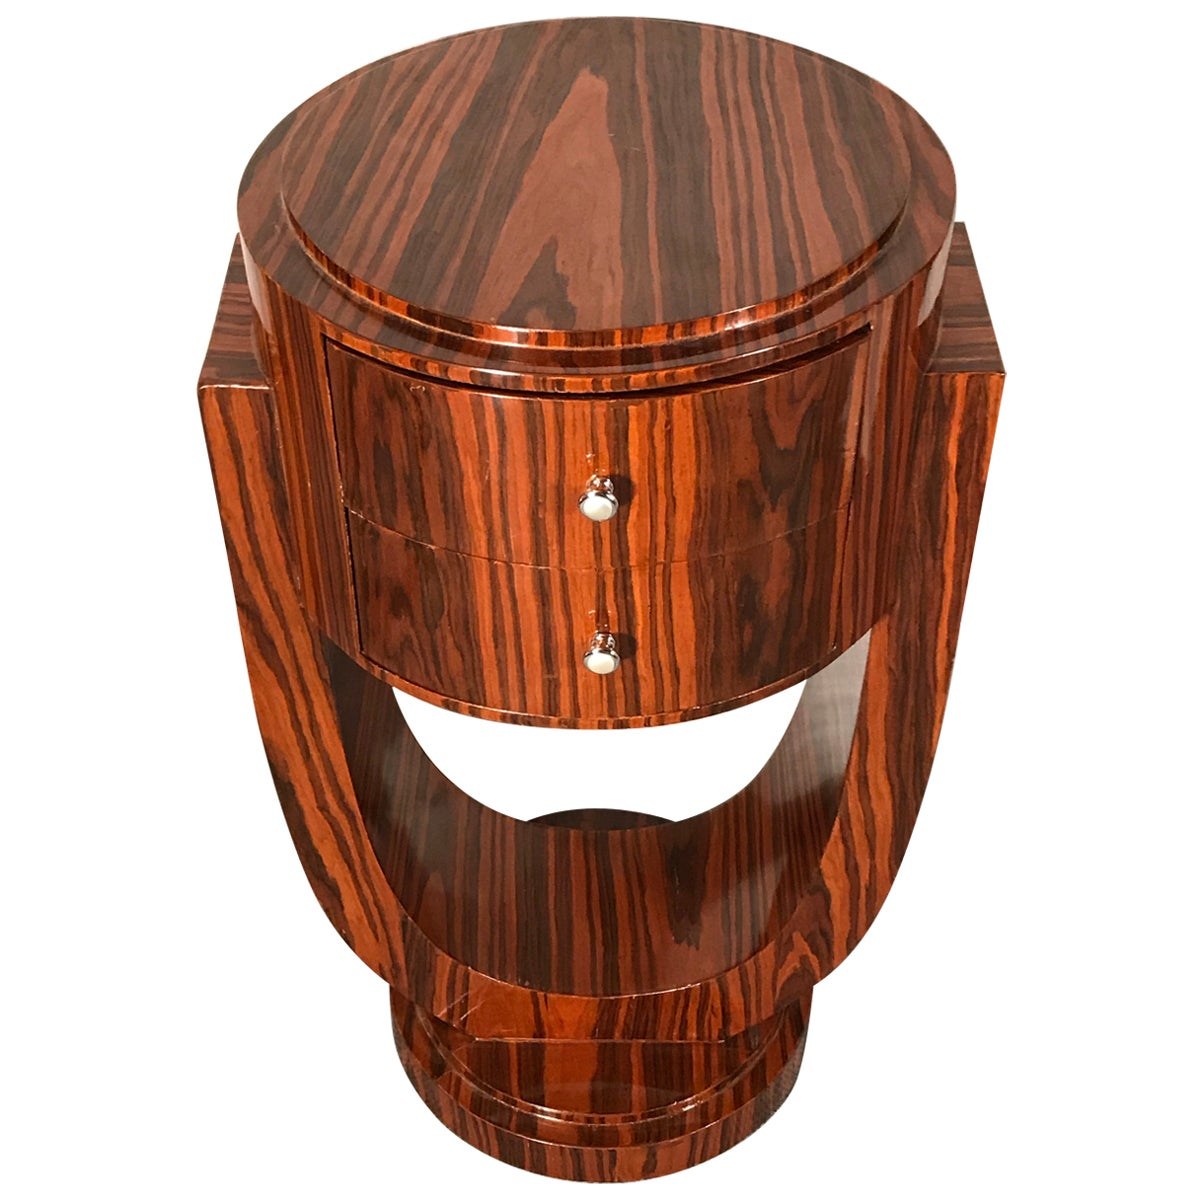 Art Deco Side Table, France 1920-1930, Makassar Ebony Wood Veneer